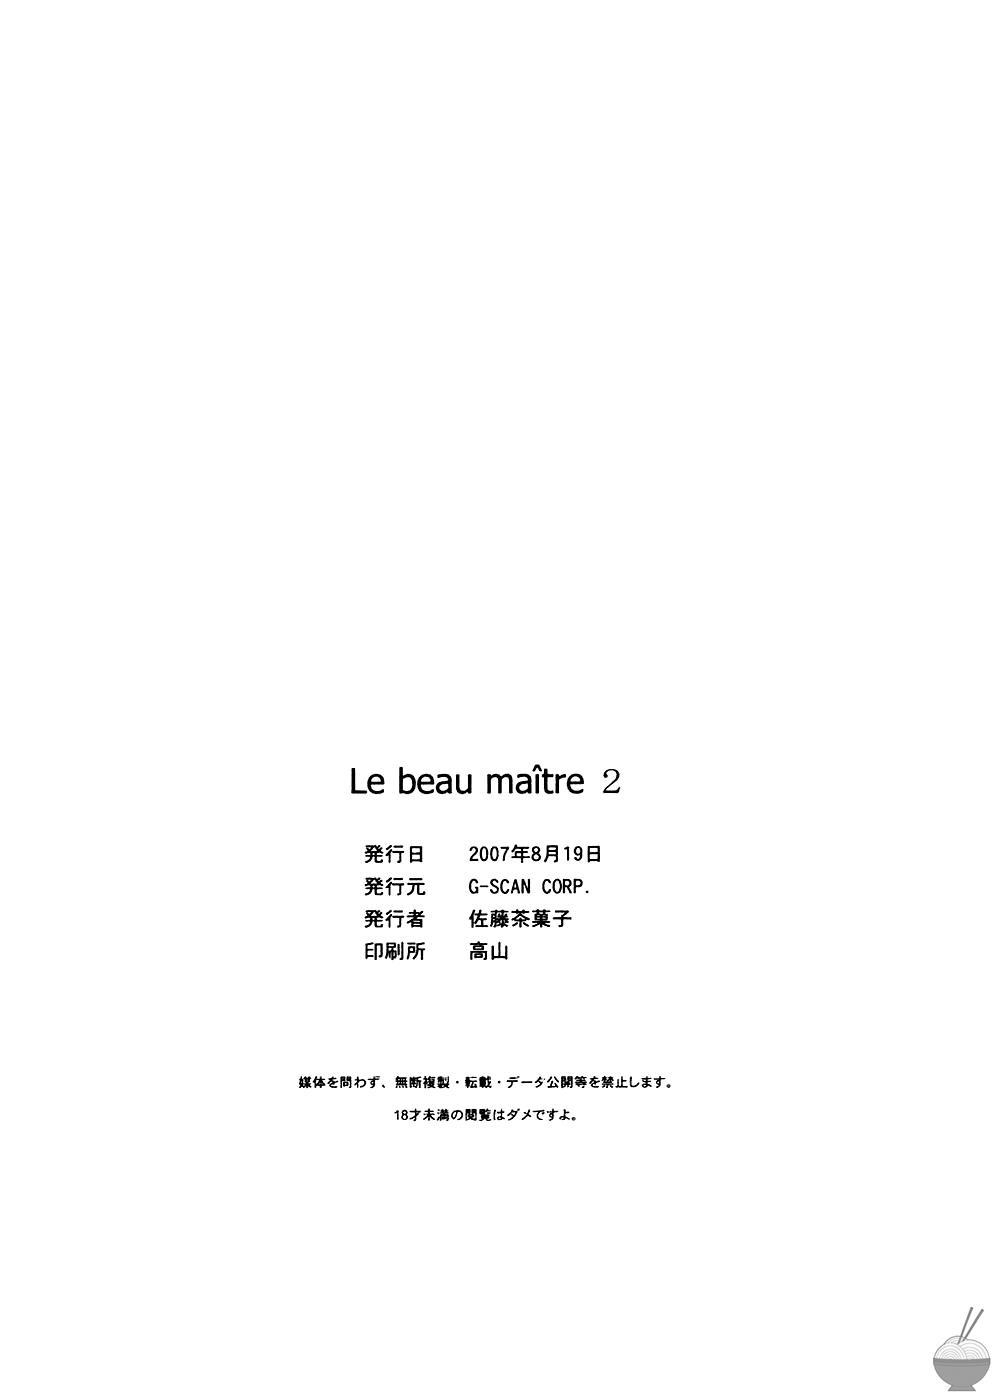 Le Beau Maitre 2 24